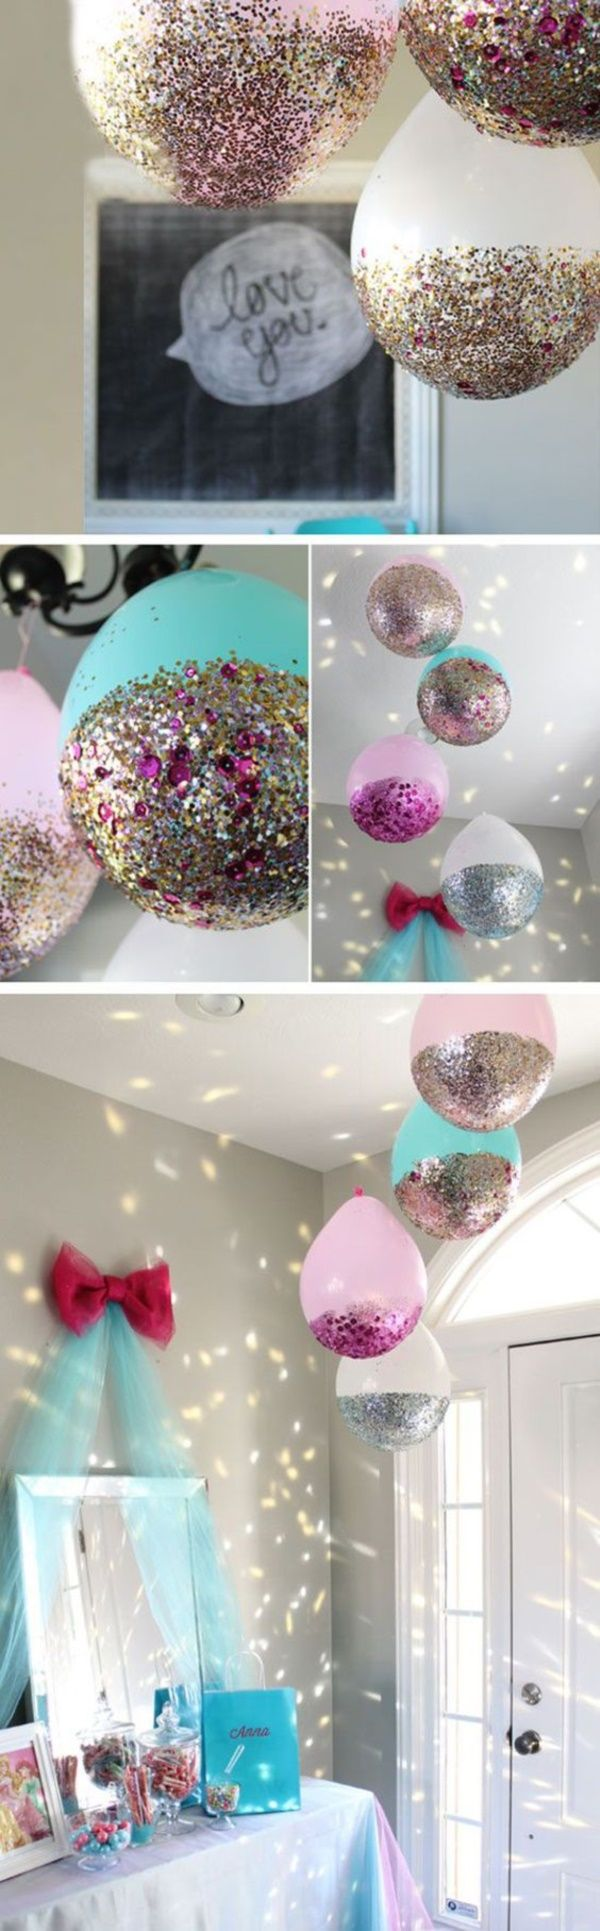 40 DIY Beautiful Birthday Party Decoration Ideas